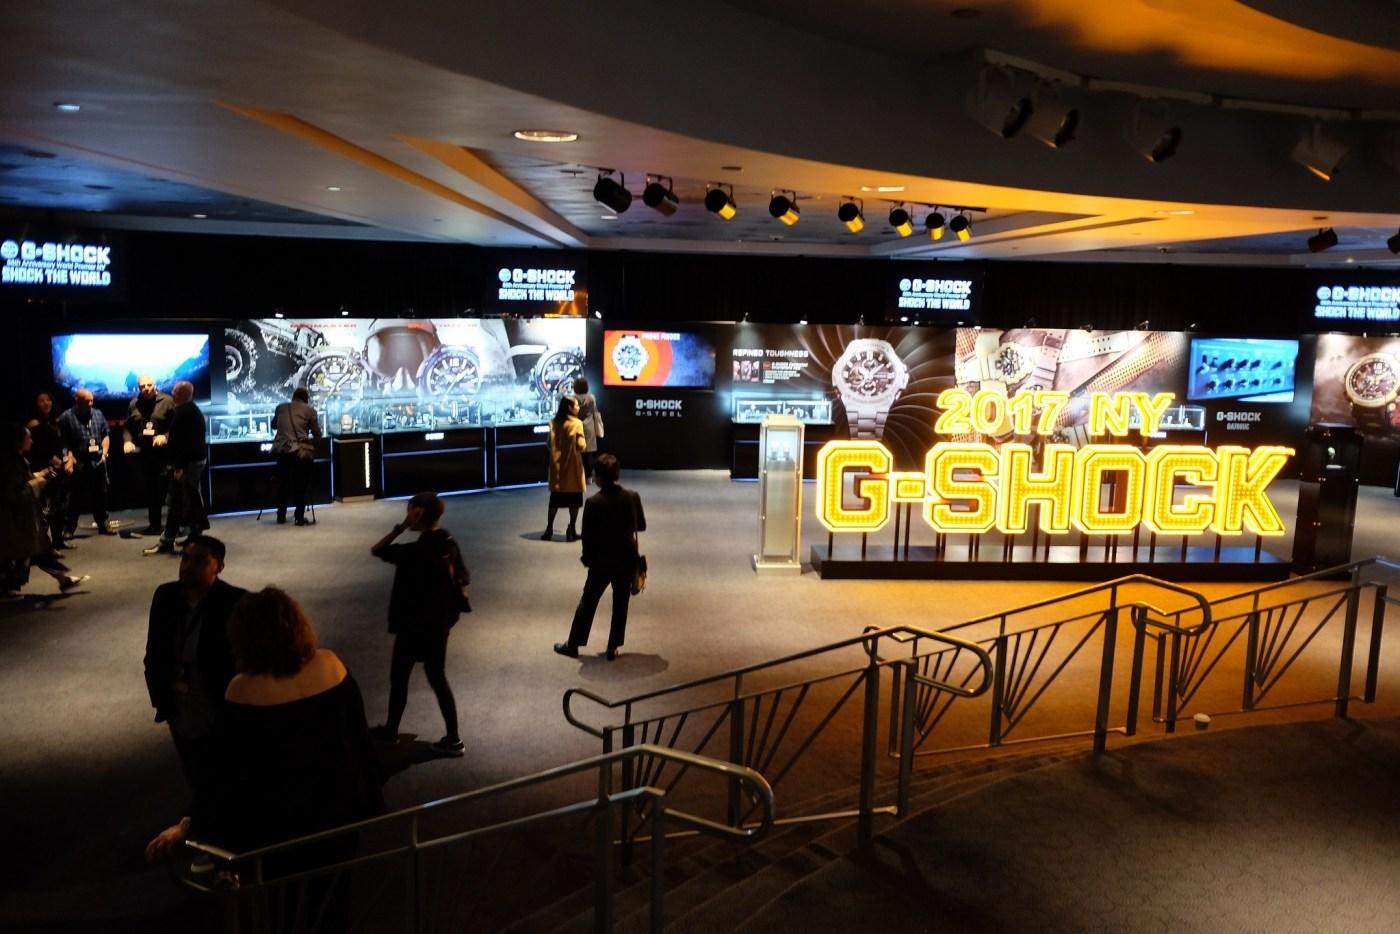 Casio G-Shock 35th Anniversary Celebration